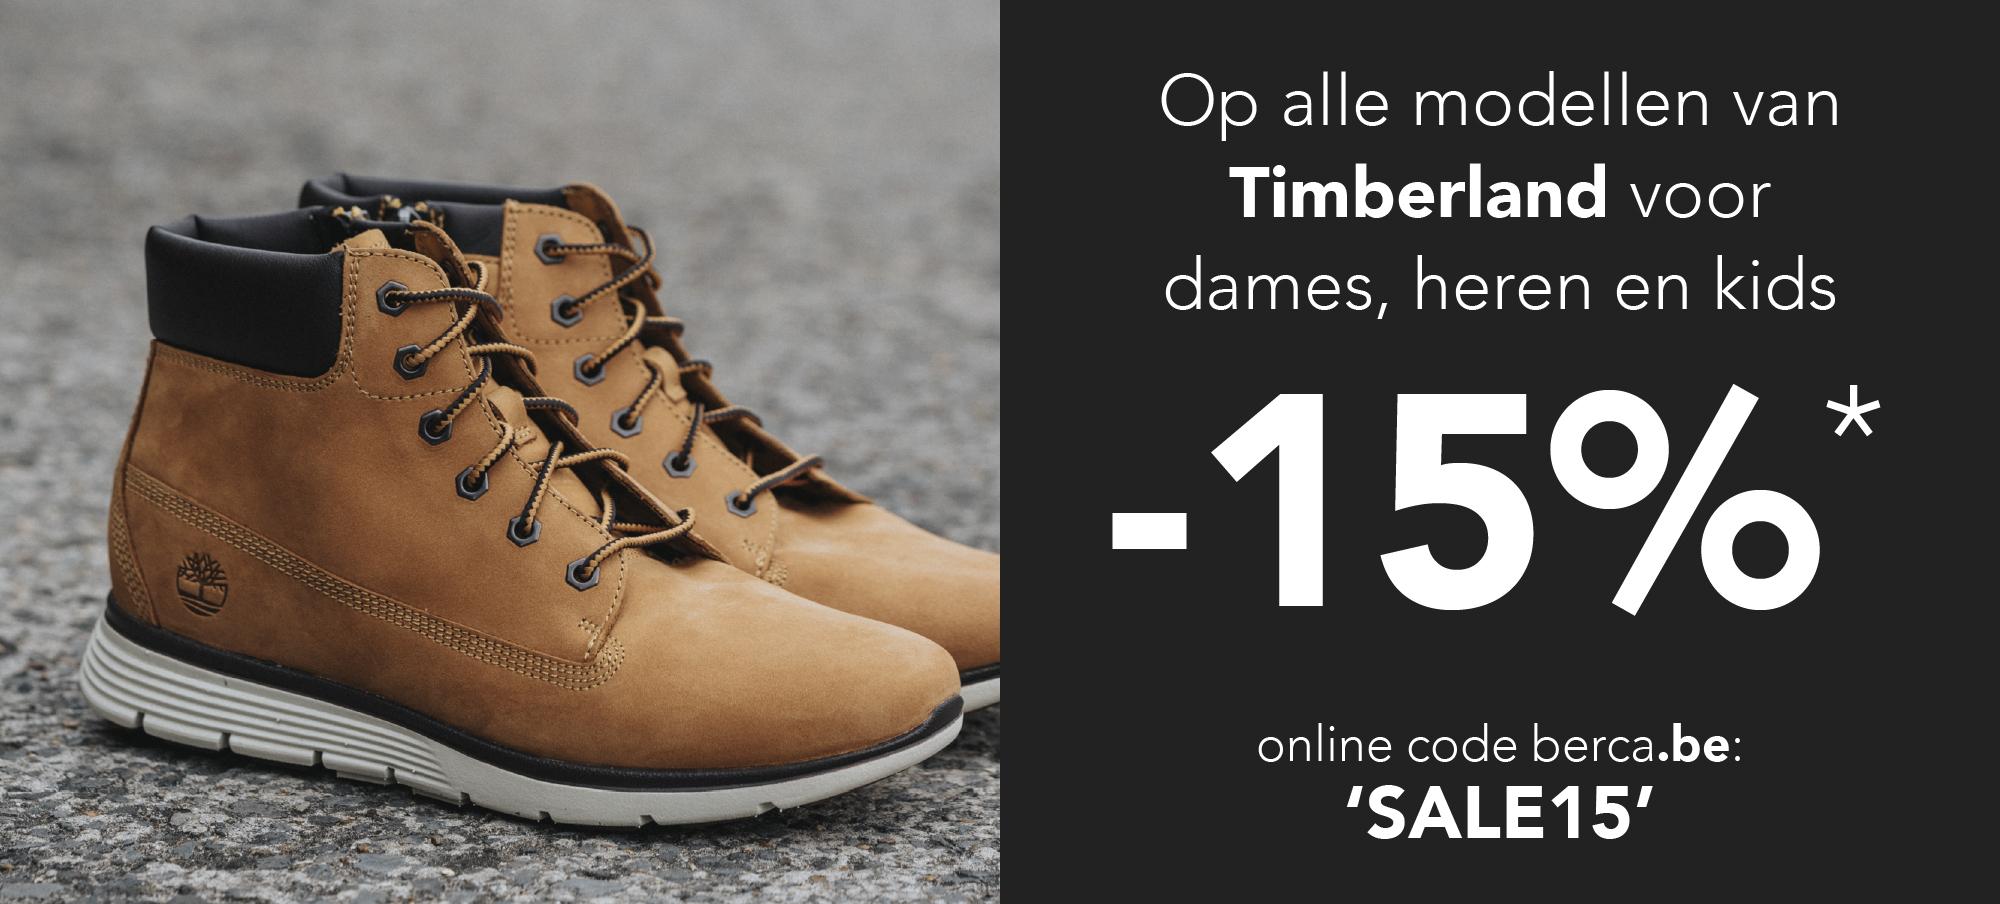 Timberland Factory Outlet, kortingen tot 50%